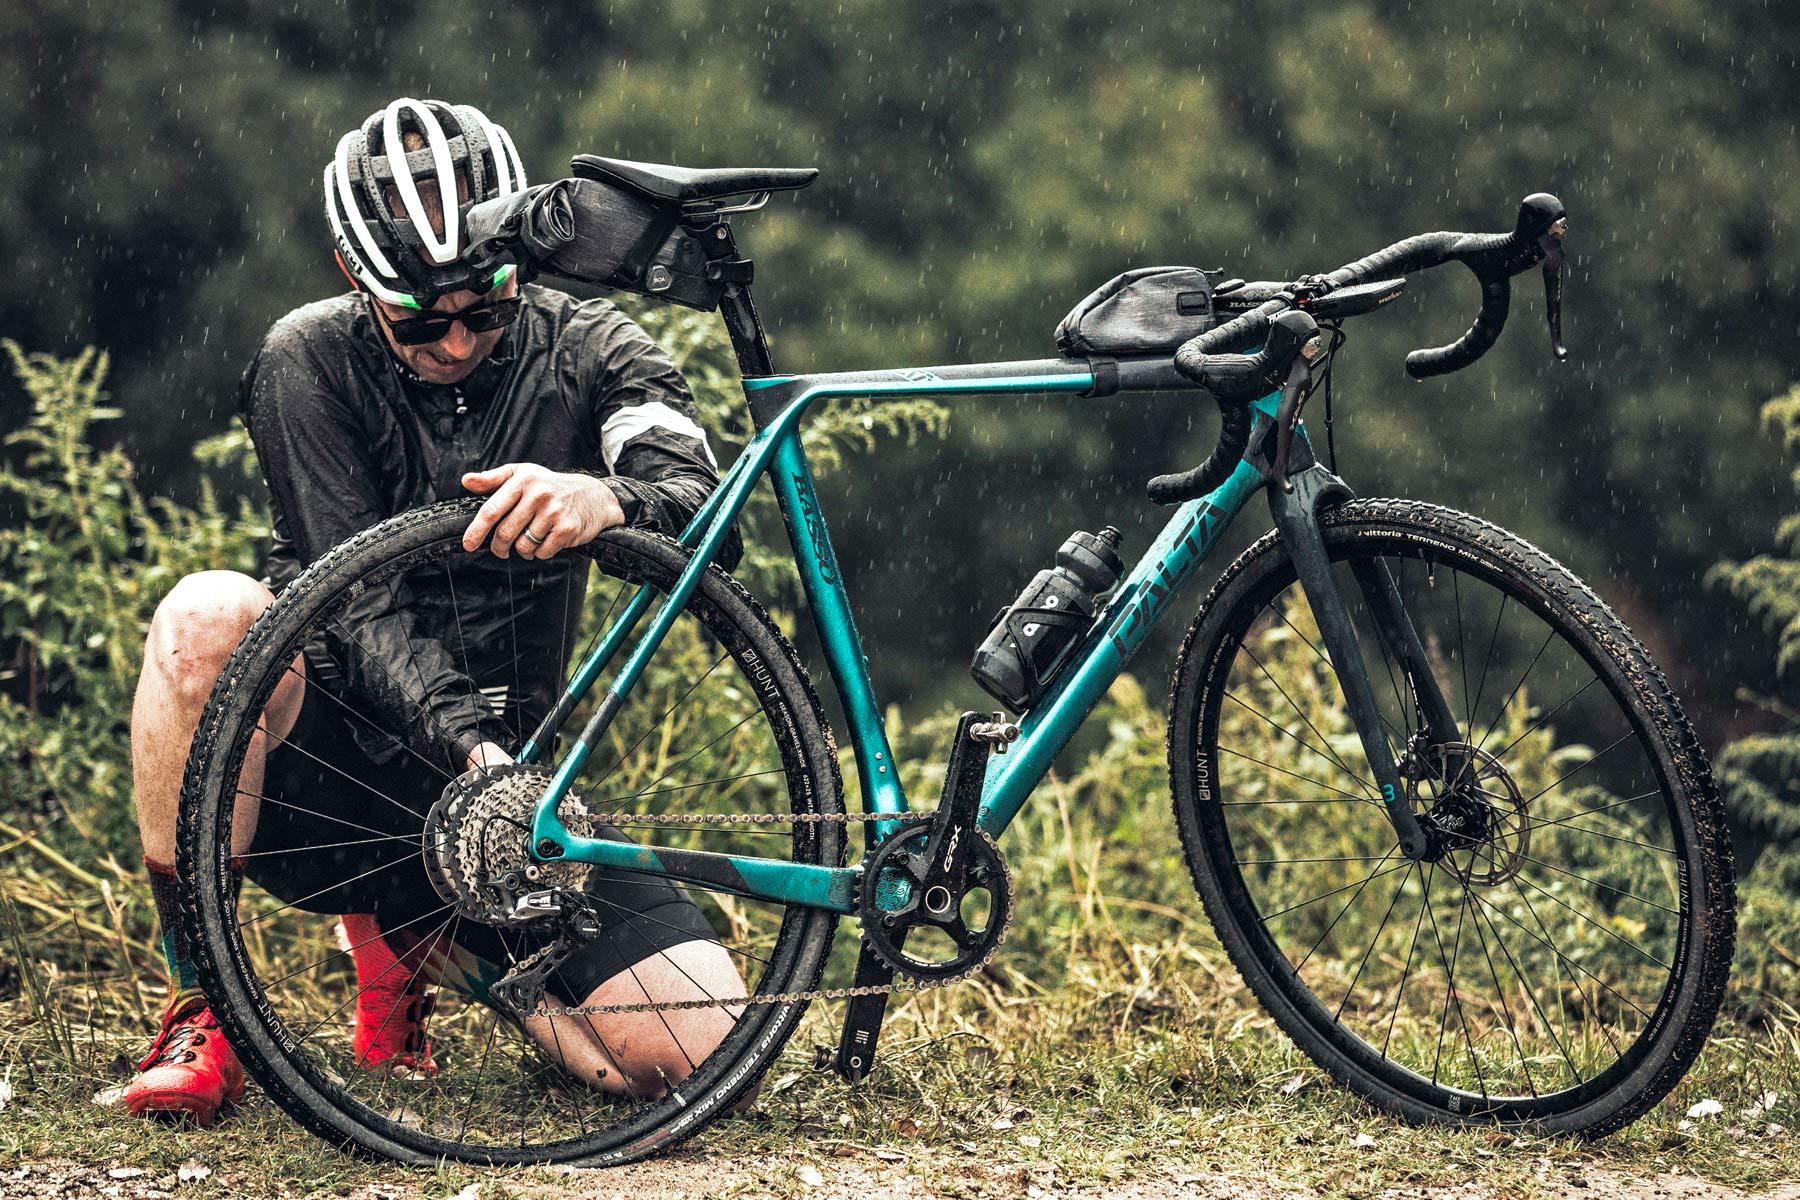 Basso Palta fast carbon gravel road bike - review: road-inspired fast, stiff, made-in-Italy, photo by Javi Echevarria Ruiz, rain